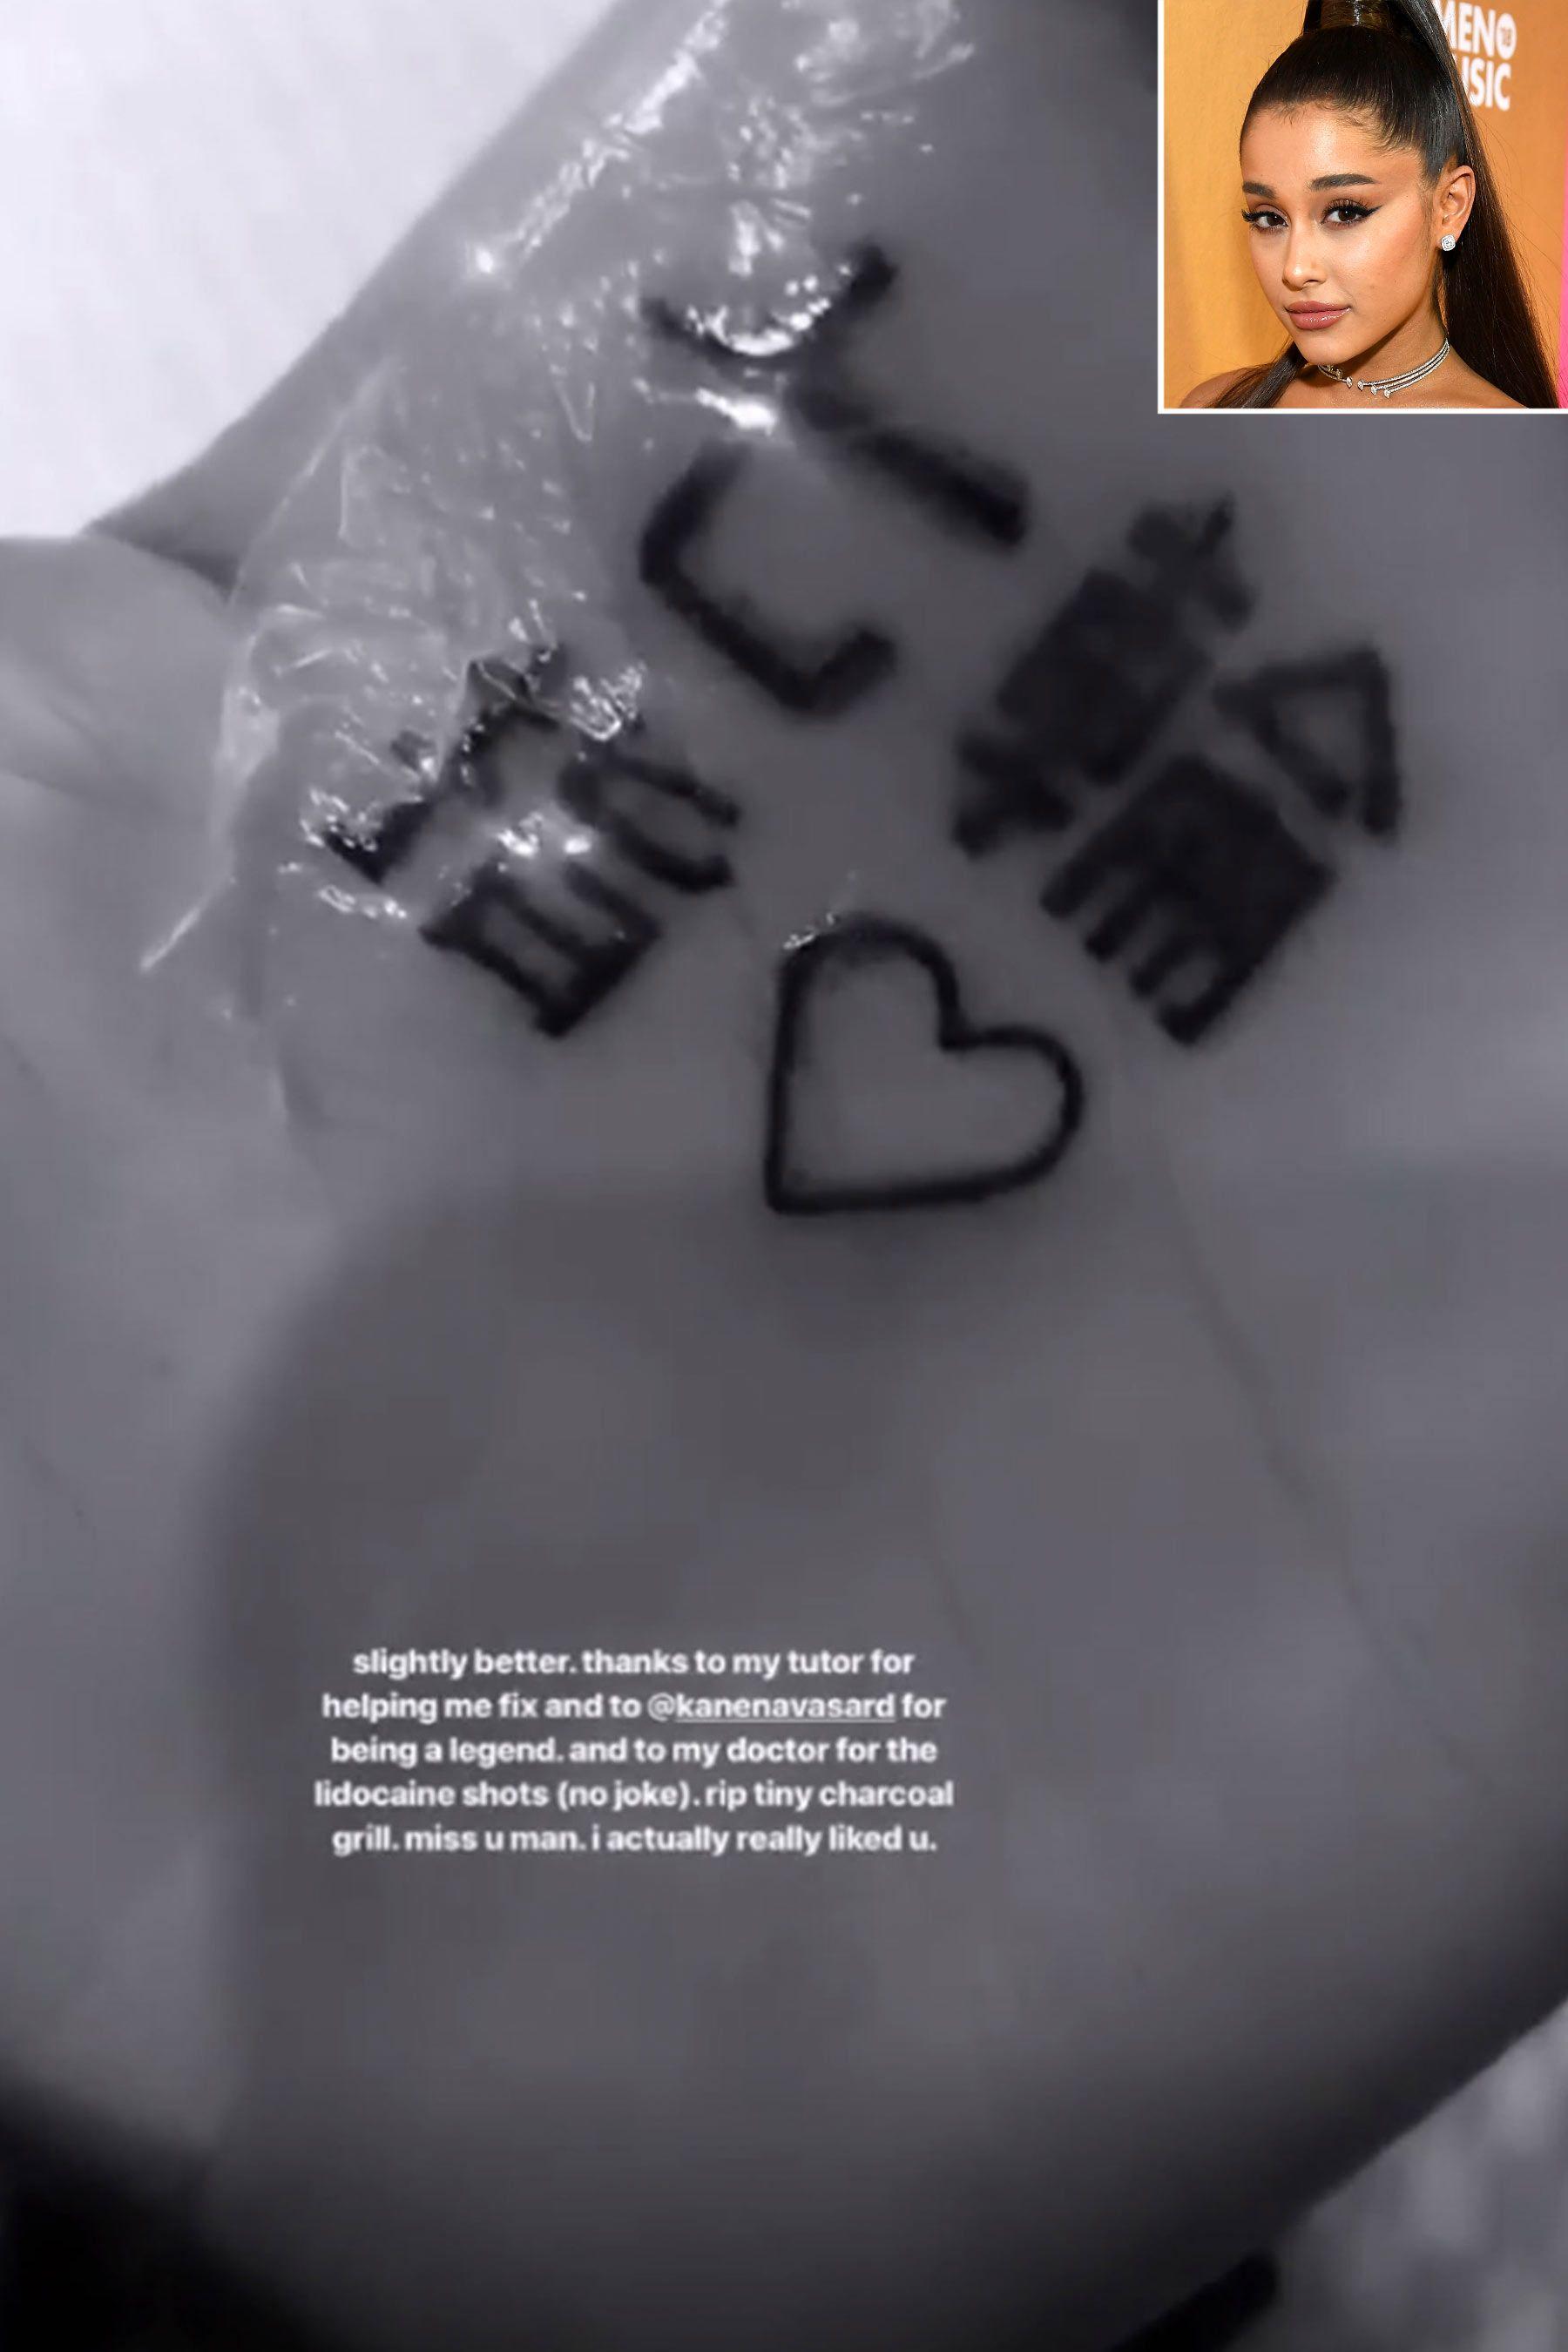 28+ Stunning Mark wahlberg tattoo removal video ideas